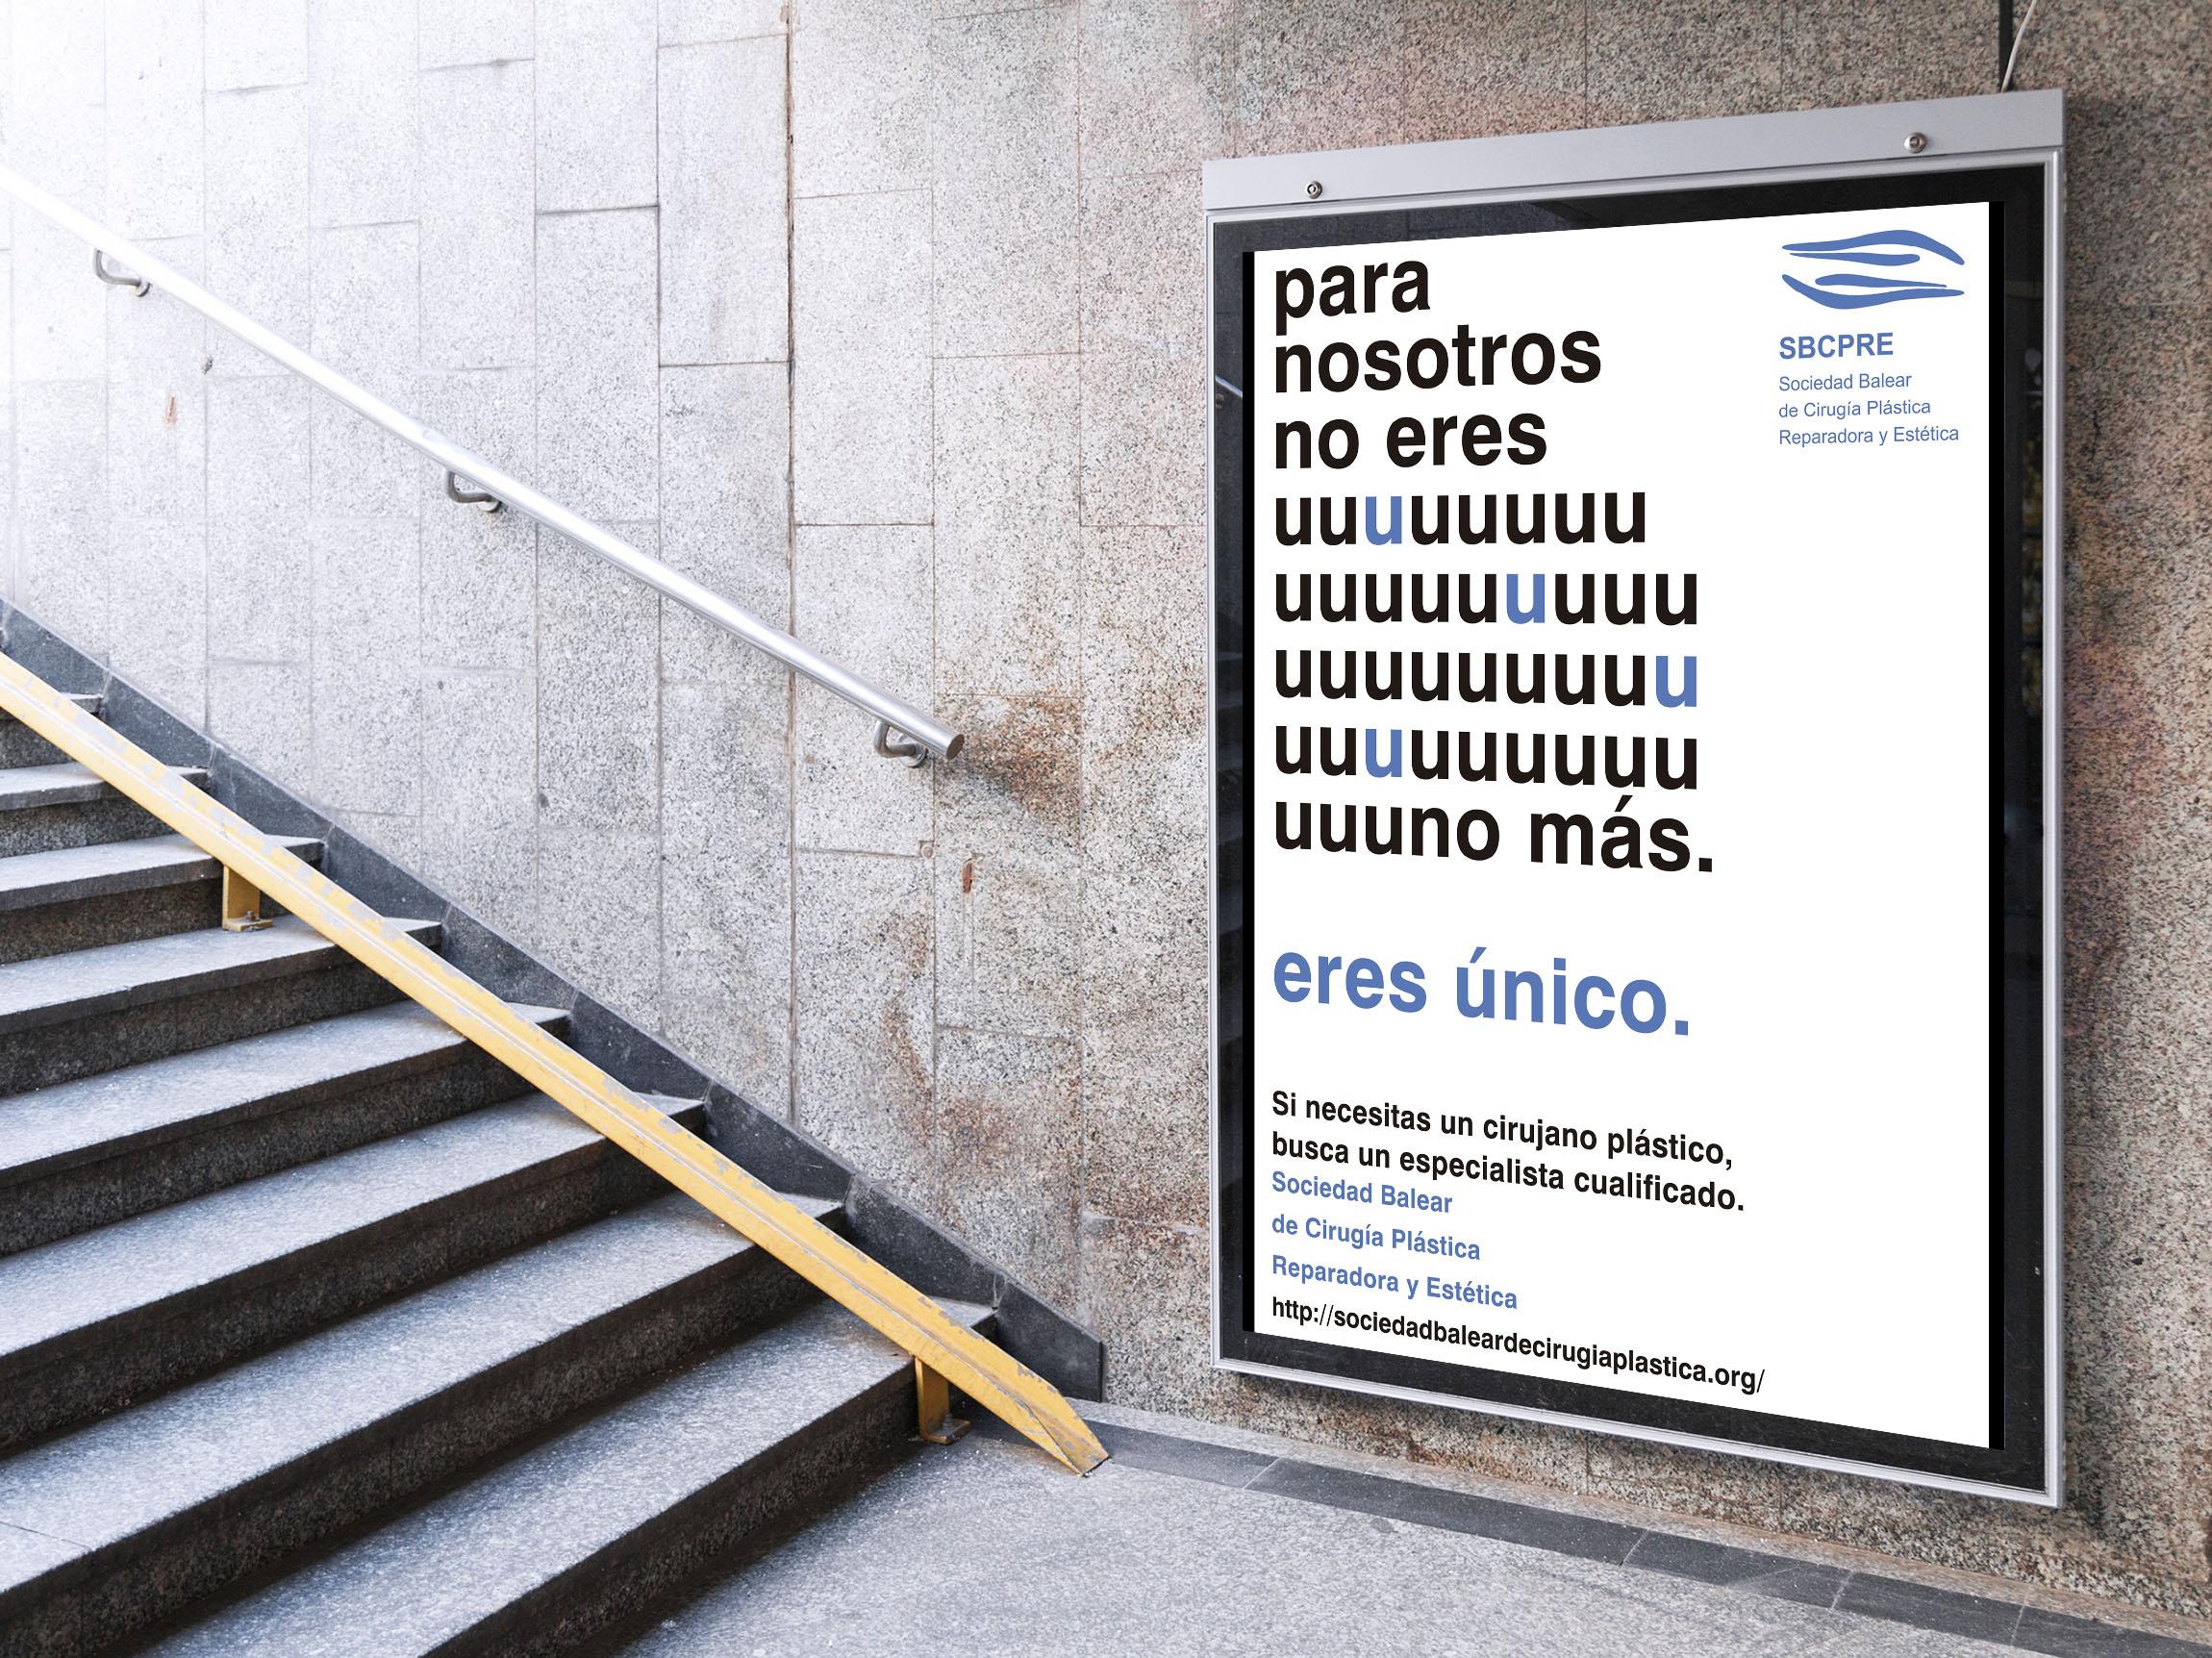 Cartel Tipográfico by Raquel Castañeda Gelabert - Creative Work - $i